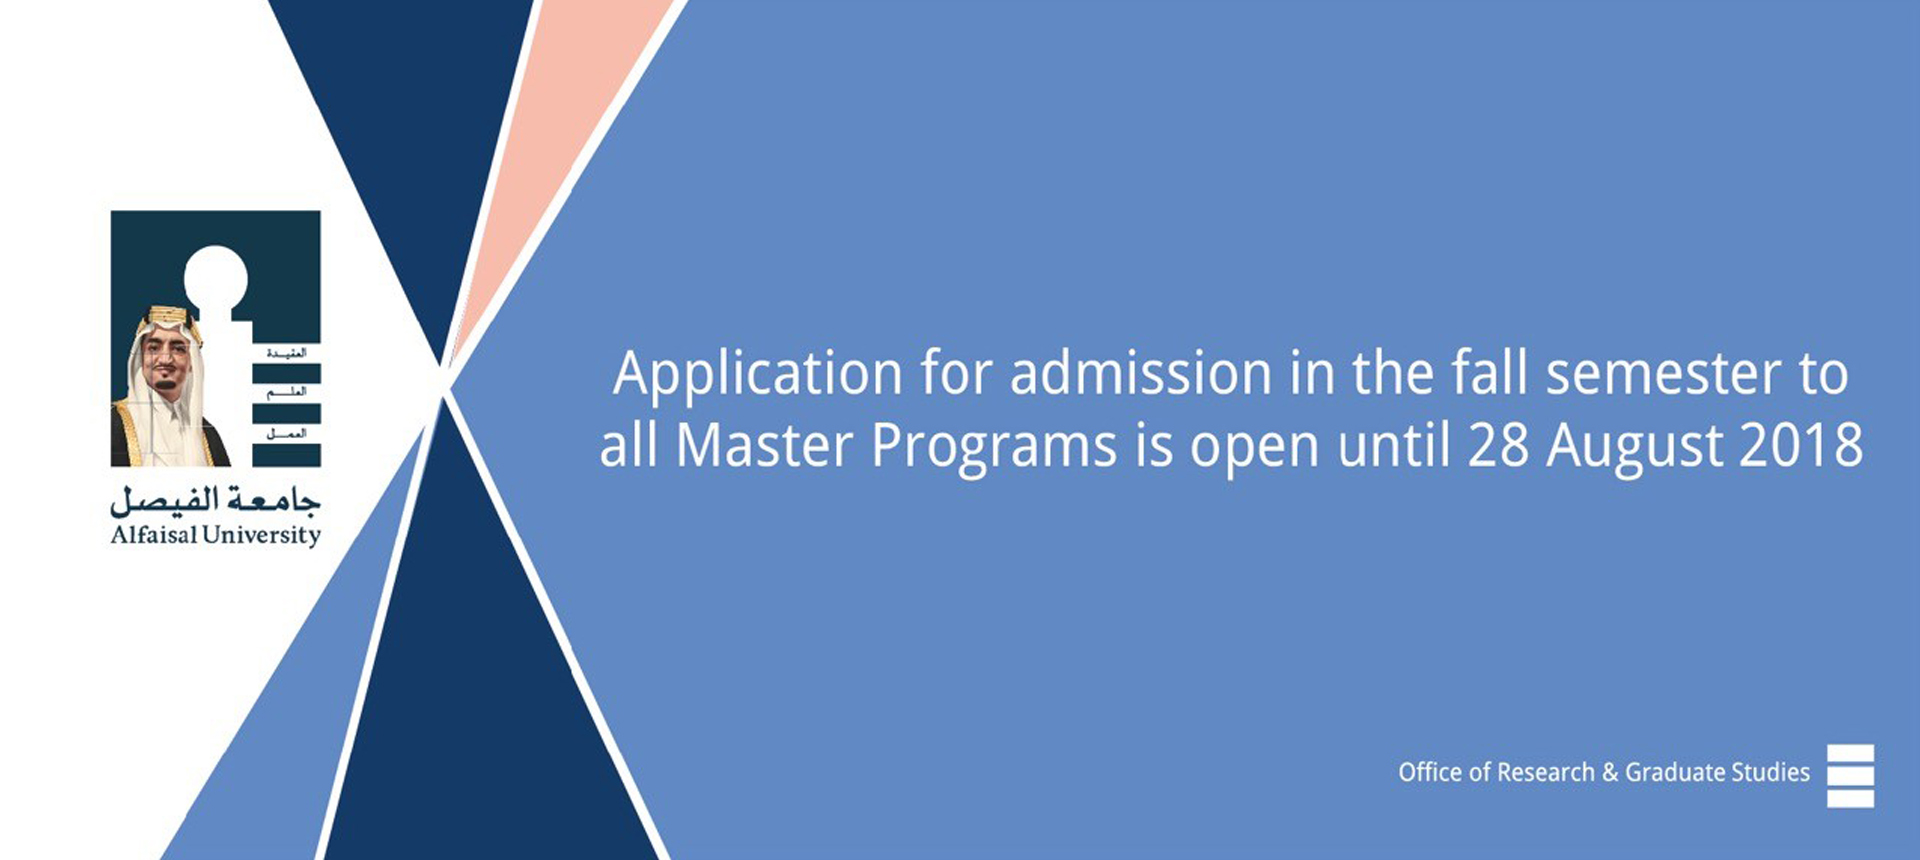 Research and Graduate Studies at Alfaisal University